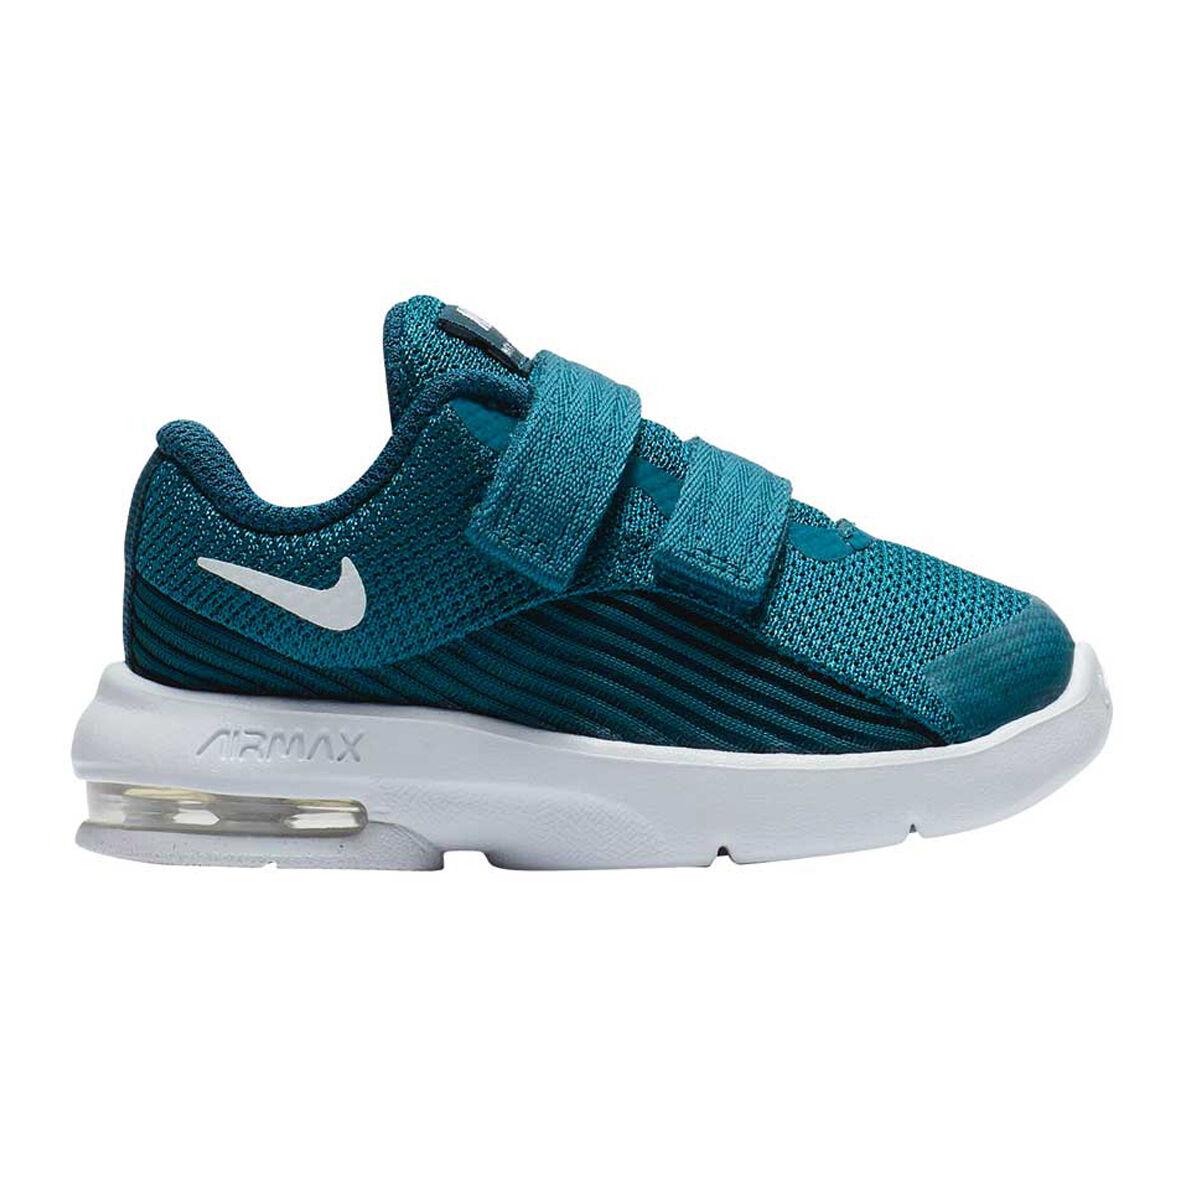 Nike Air Max Advantage 2 Kids Running Shoes